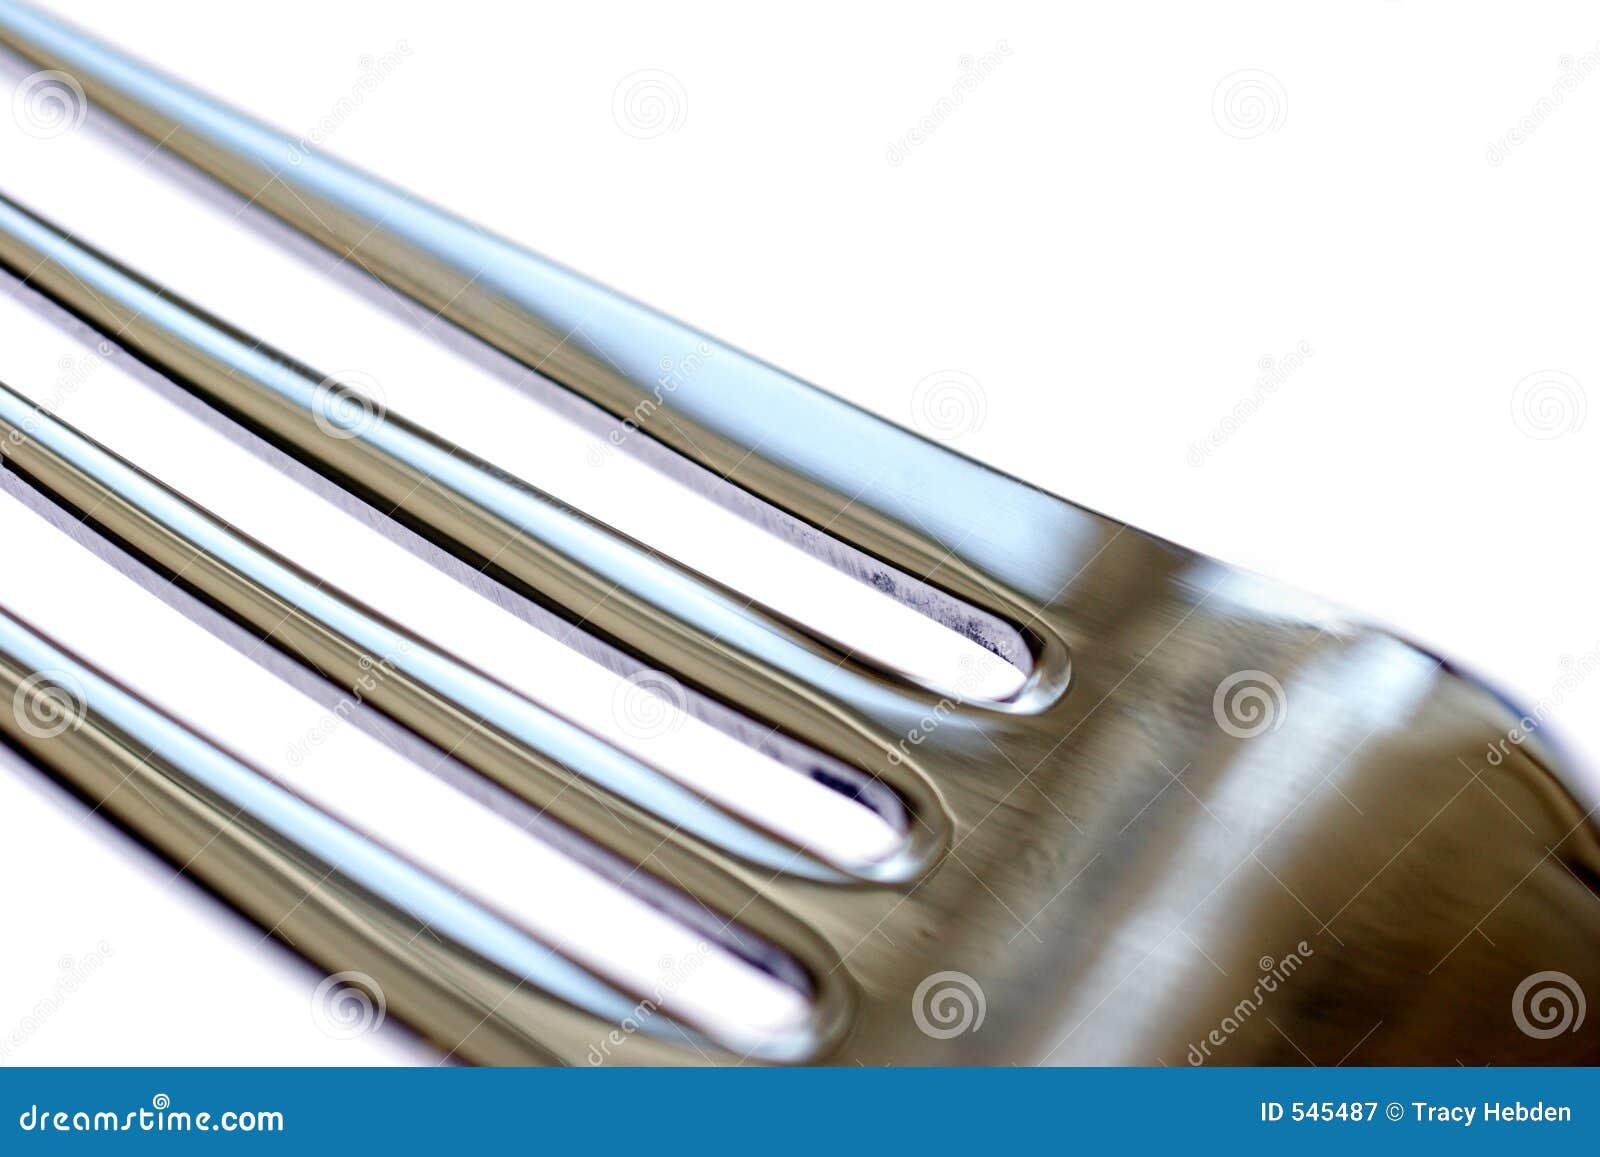 Download 叉子 库存图片. 图片 包括有 工具, 厨房, 餐馆, 用餐, 刀叉餐具, 正餐, 部分, 午餐, 严格, 器物 - 545487